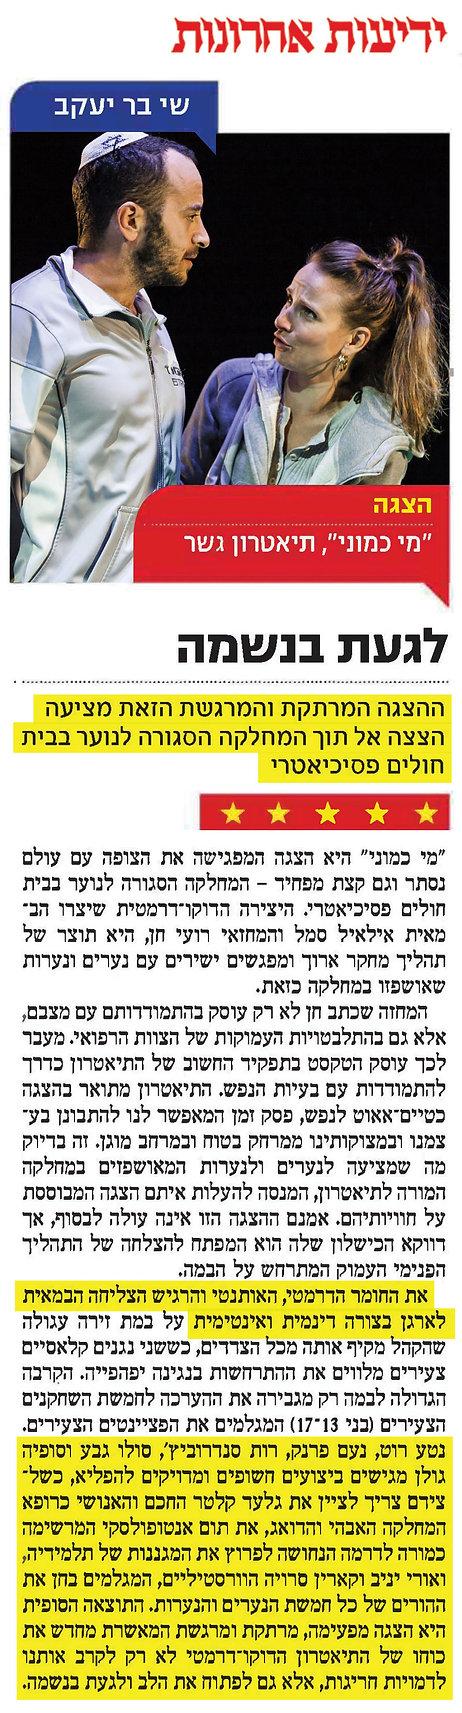 mikamoni_newsletter_yediyot_klali.jpg